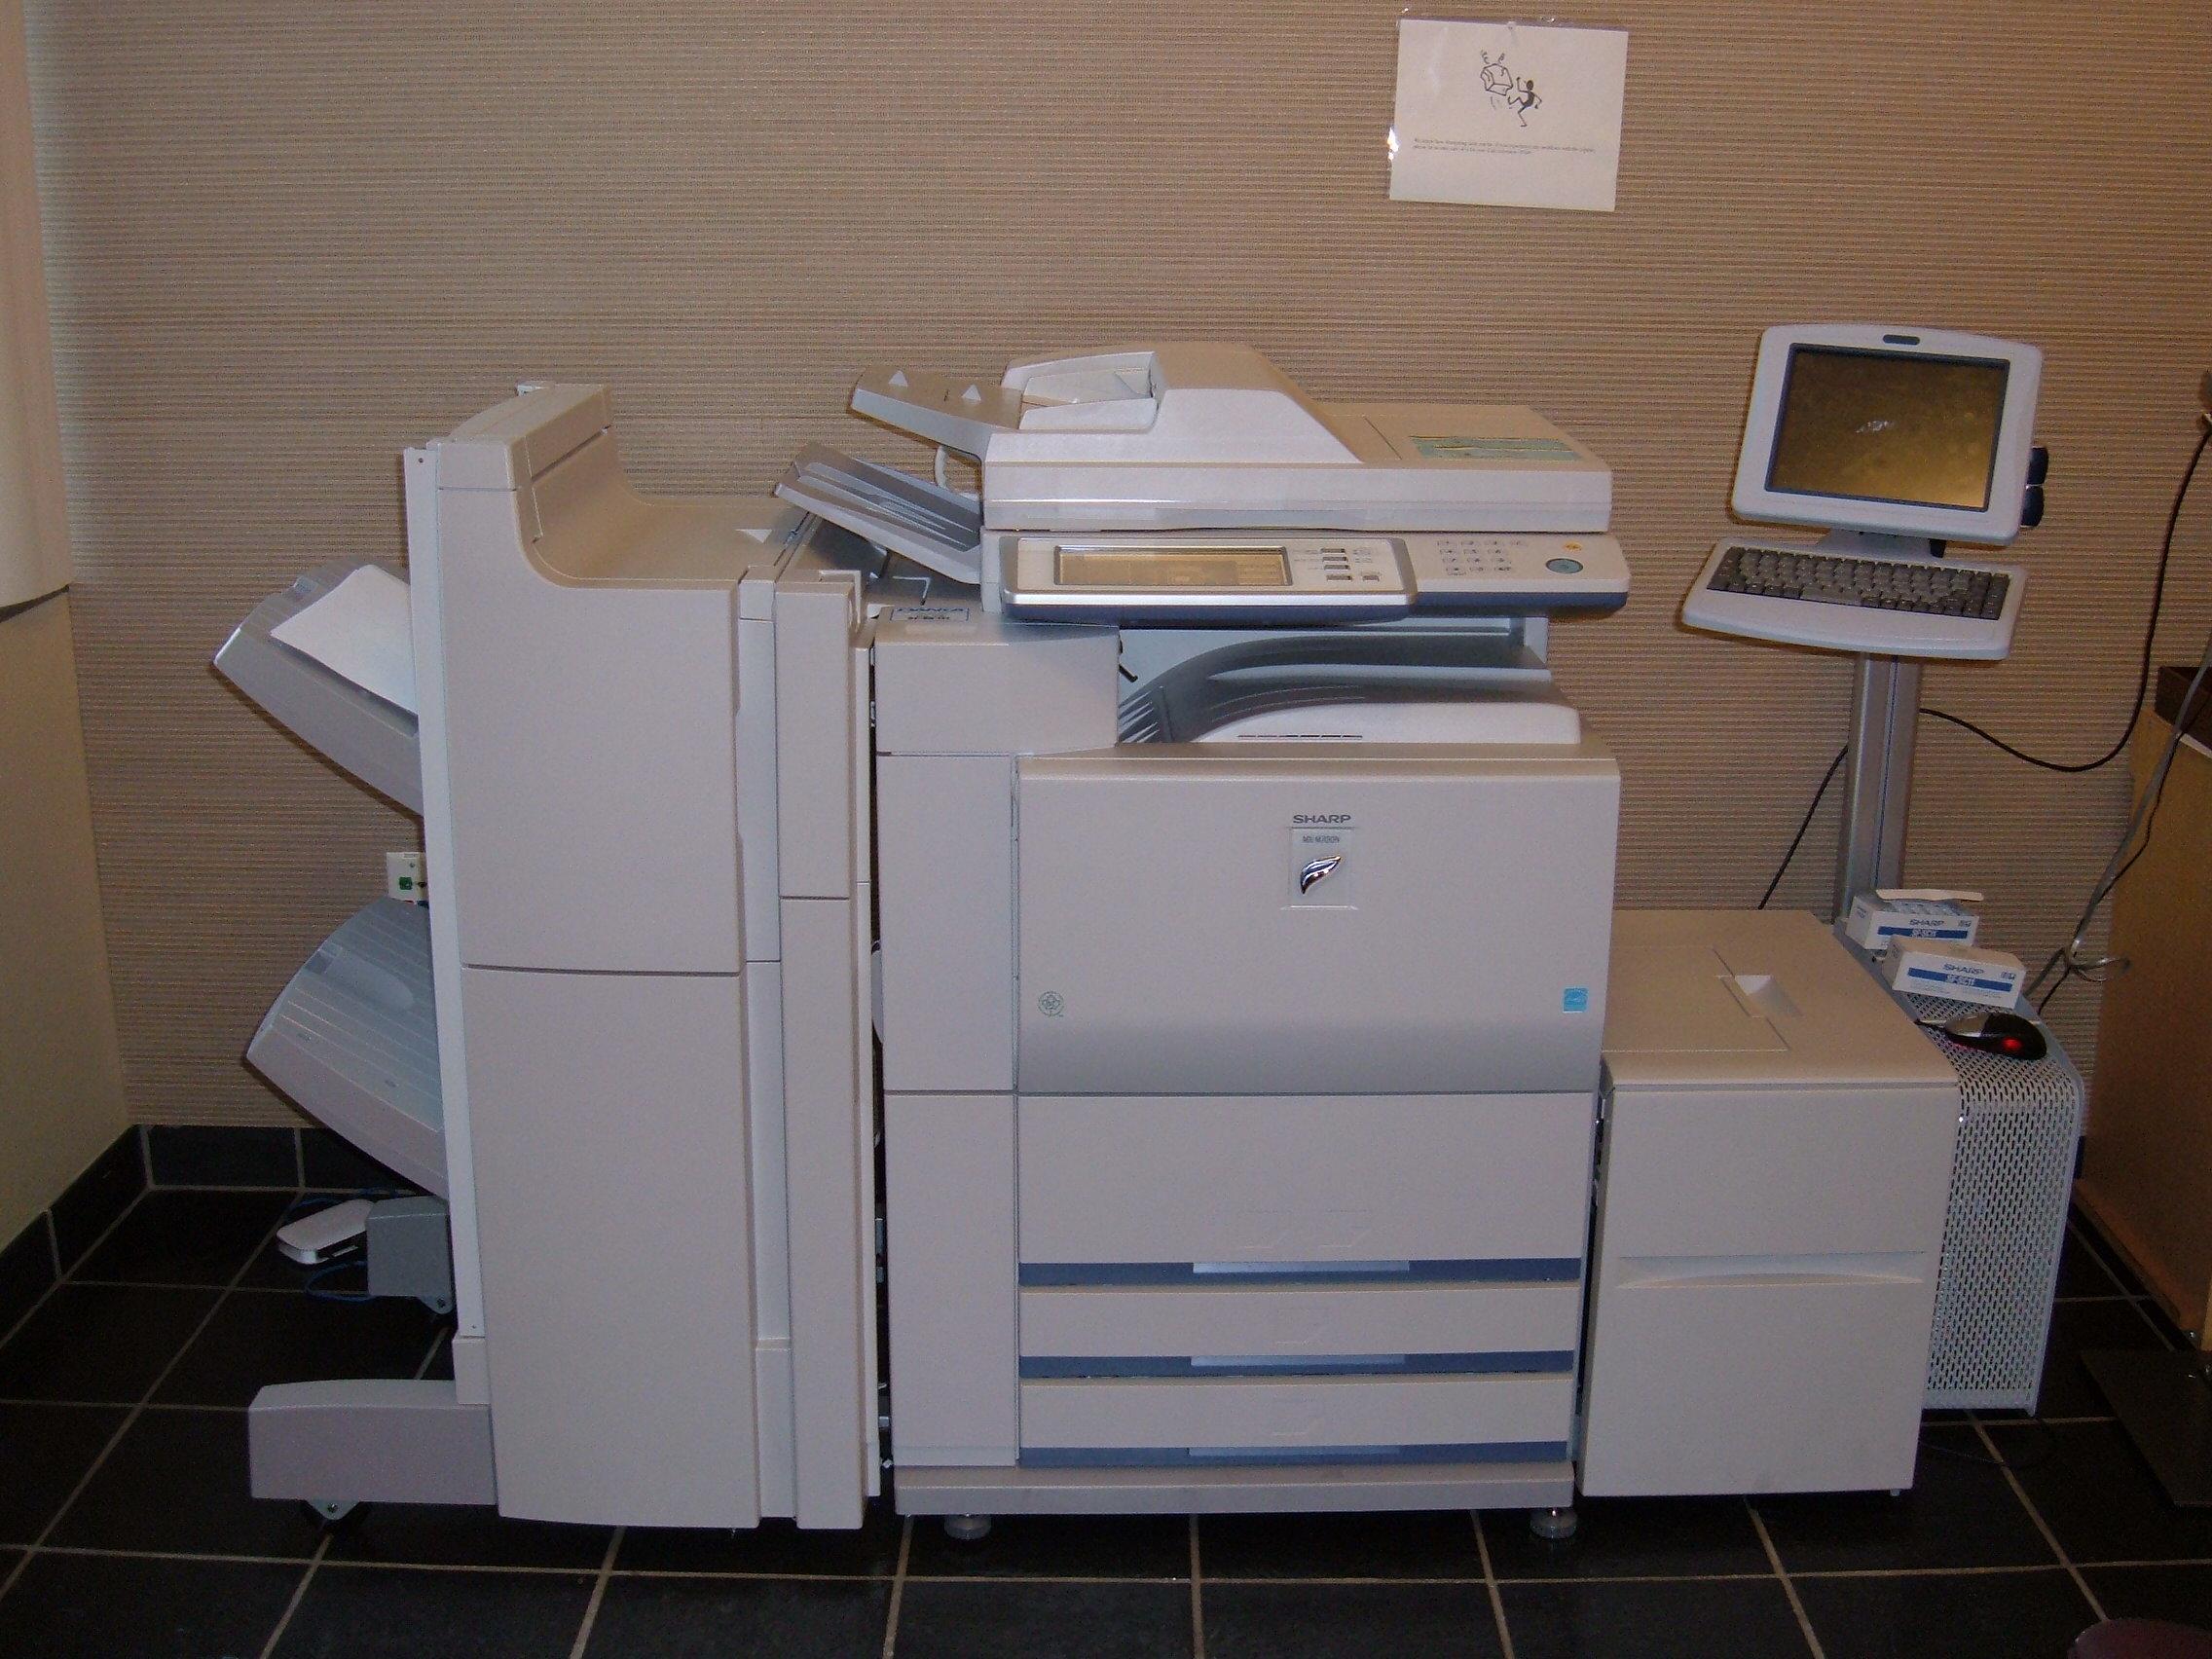 Automatic Document Feeder (ADF)